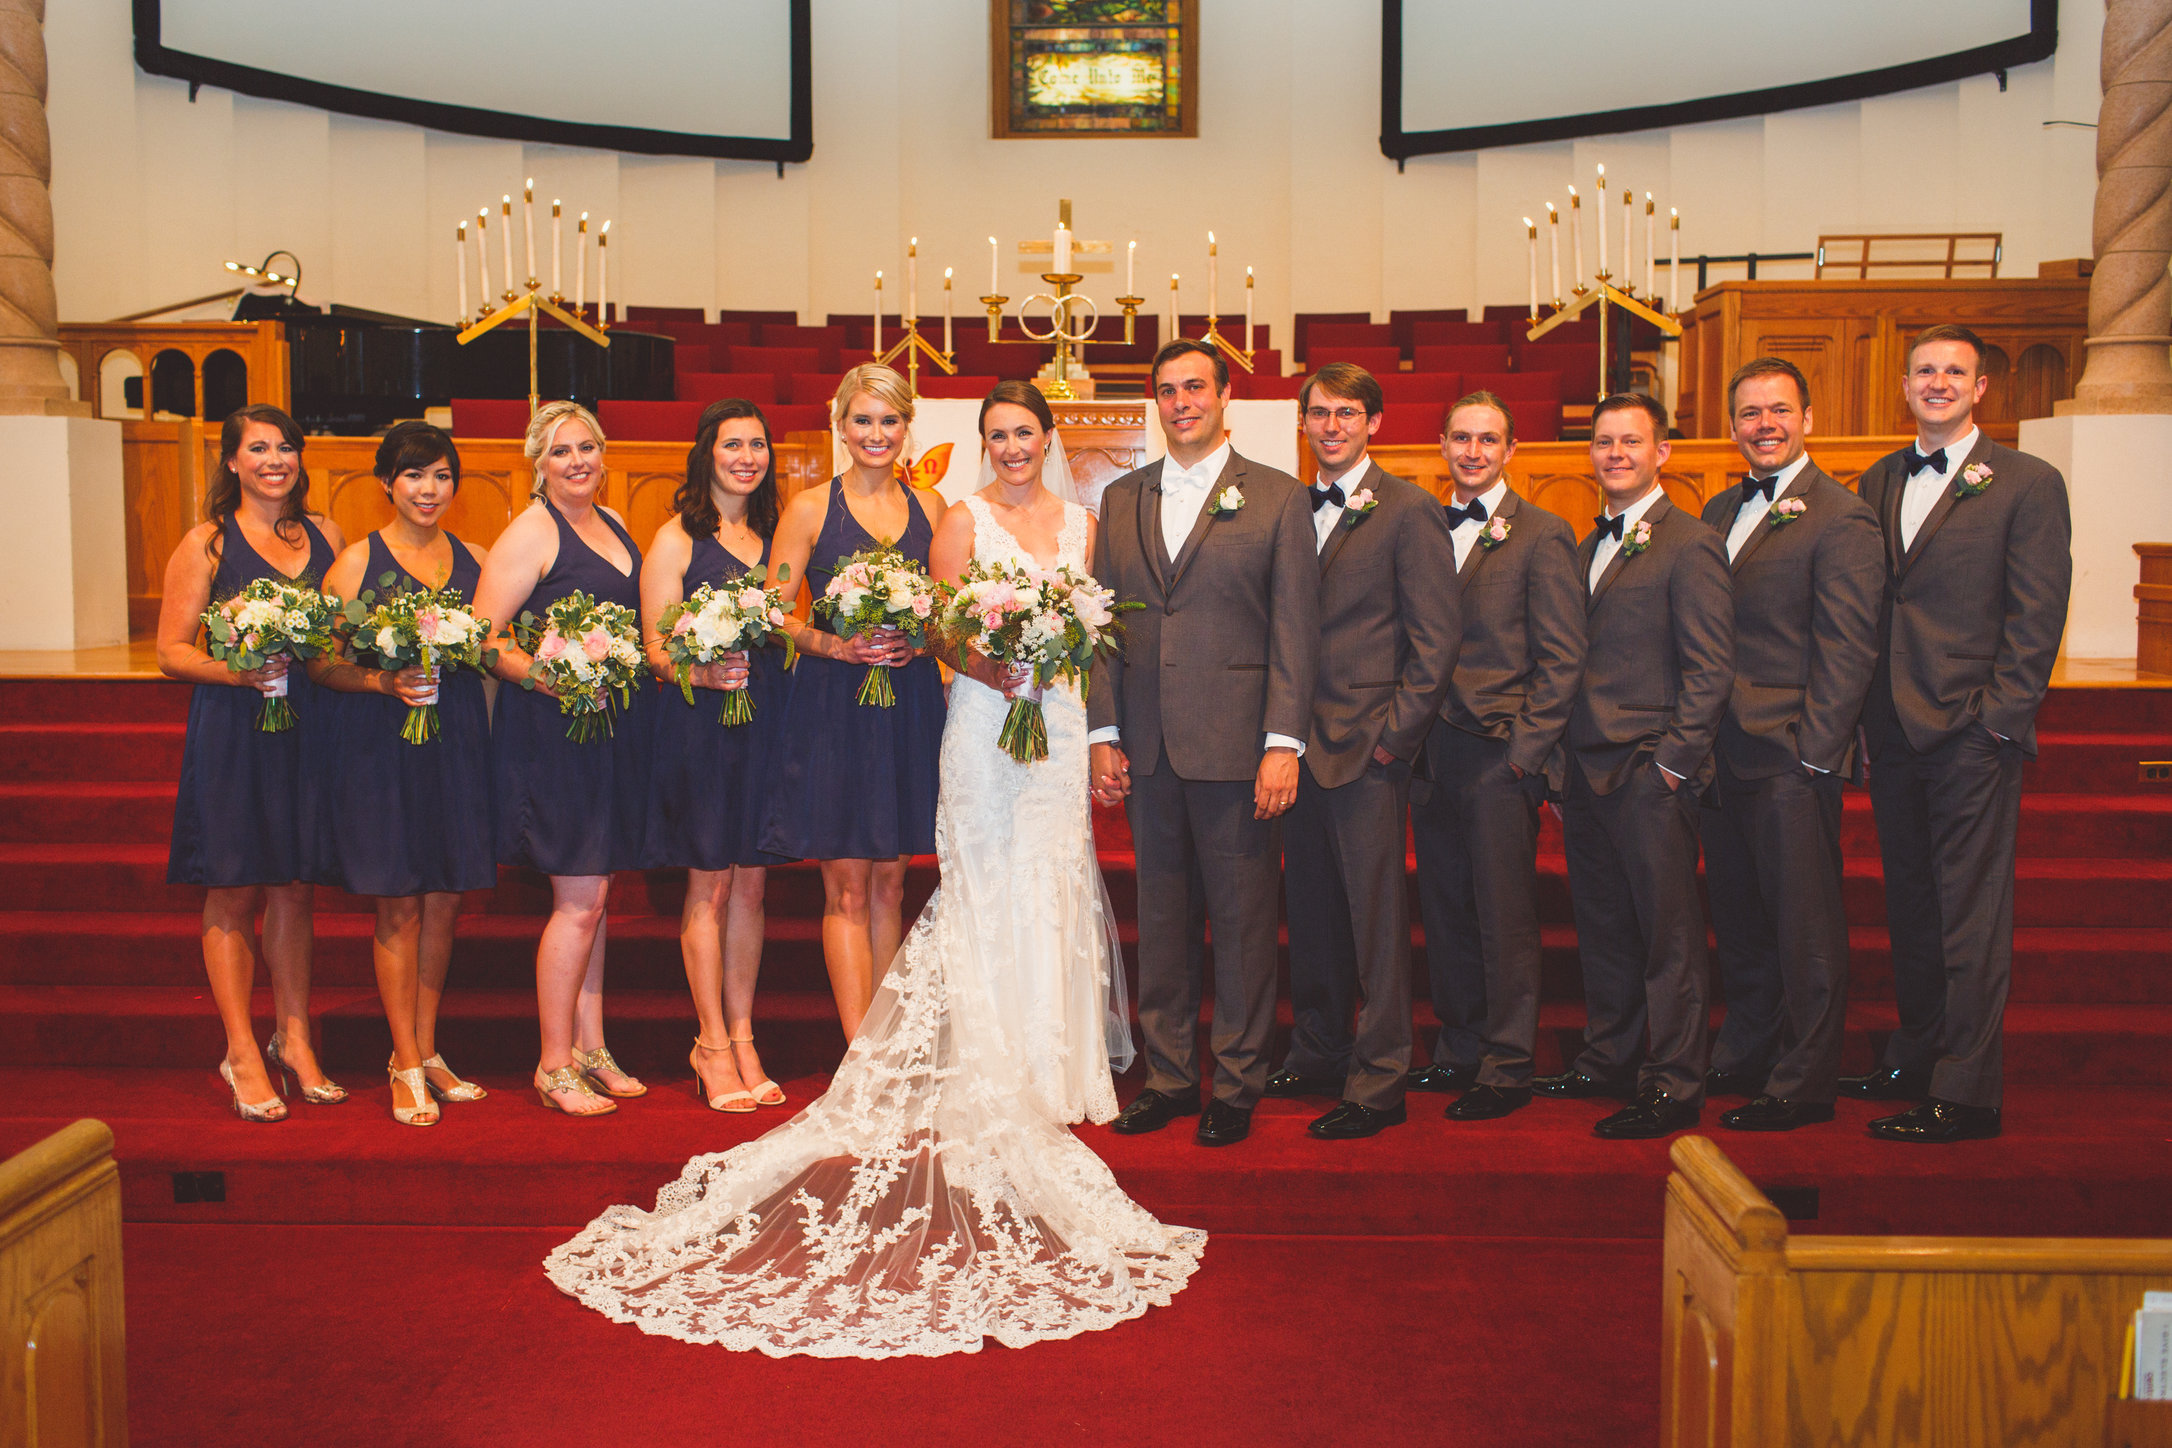 SandC-wedding-252.jpg